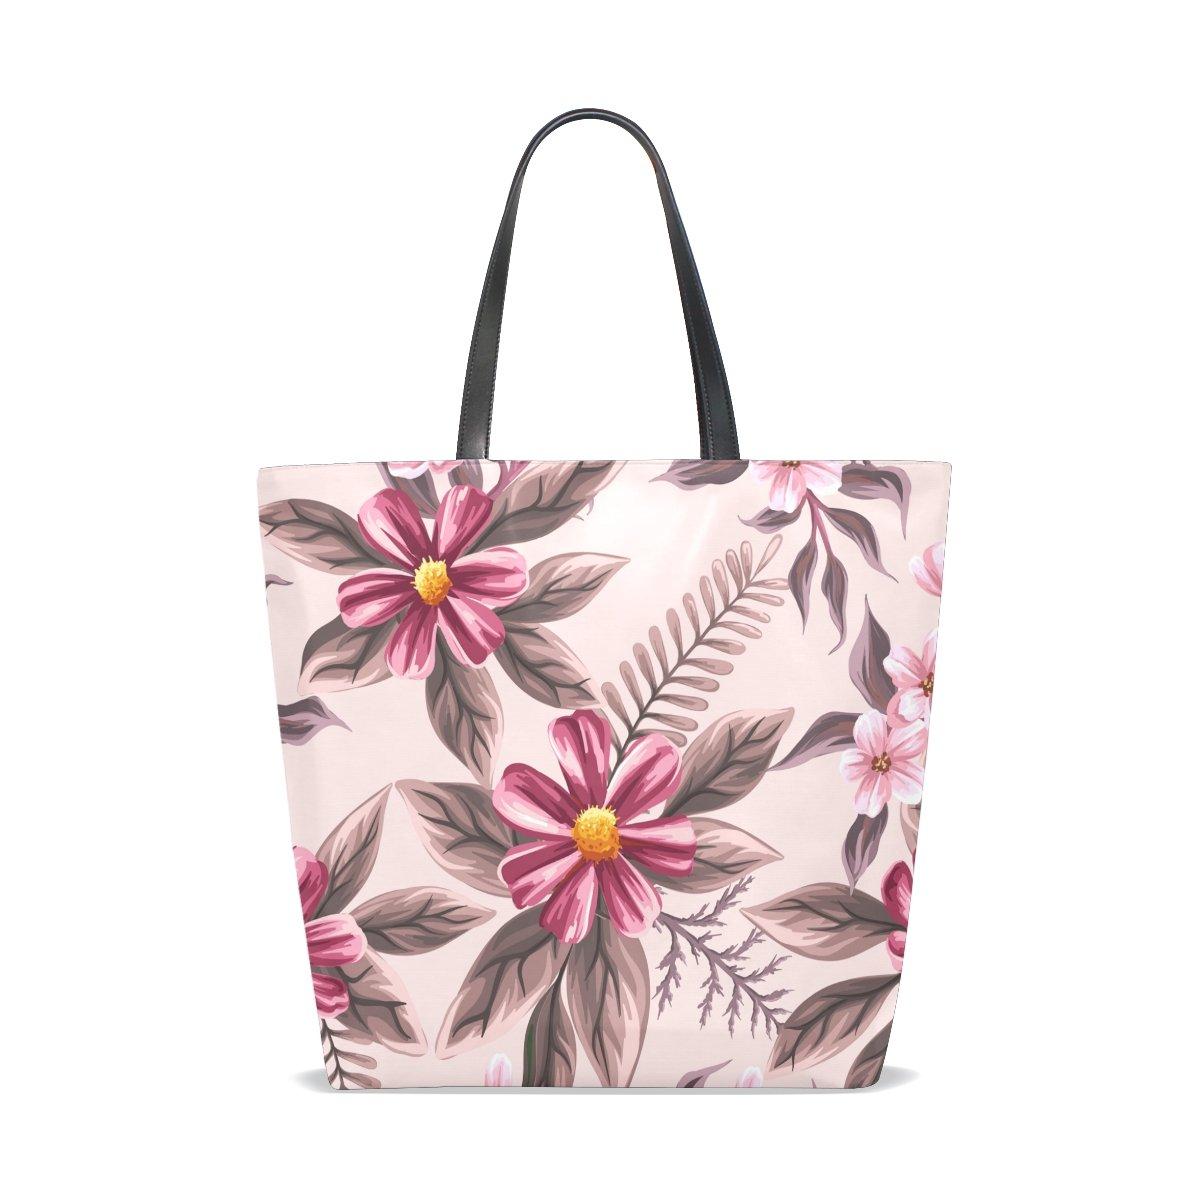 Handbags for Women Watercolor Flowers Tropical Plants Leaf Tote Shoulder Bag Satchel for Ladies Girls